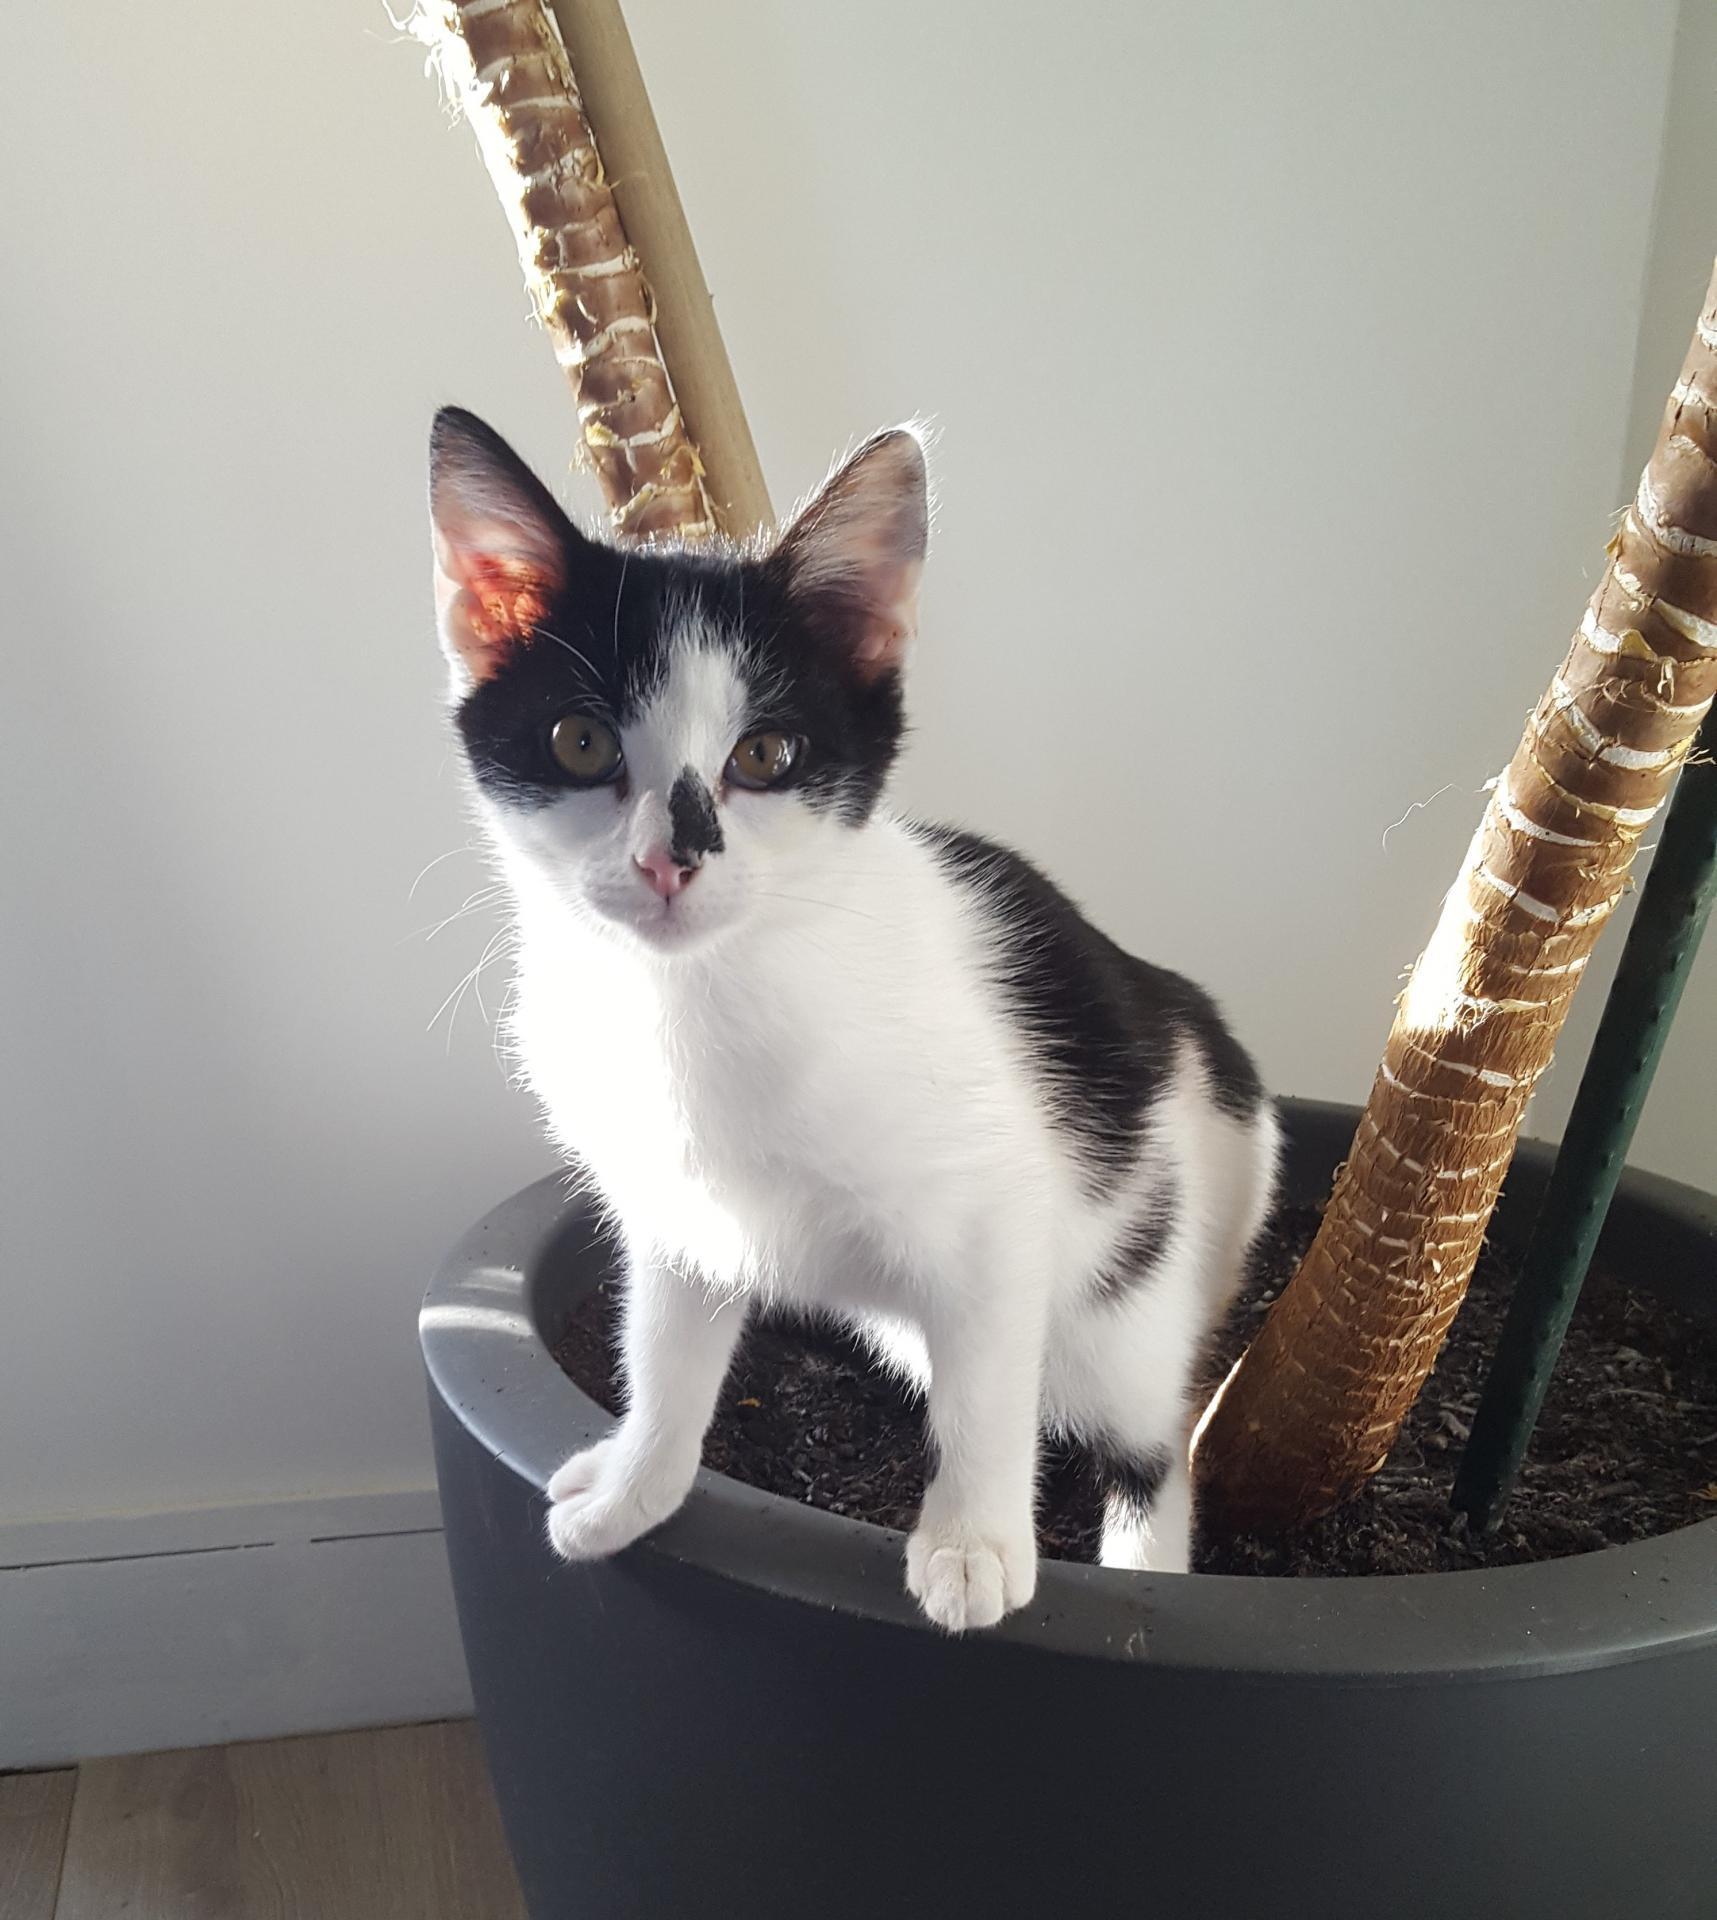 OLYA - F - Née le 10/09/2018 - Adoptée en Janvier 2019